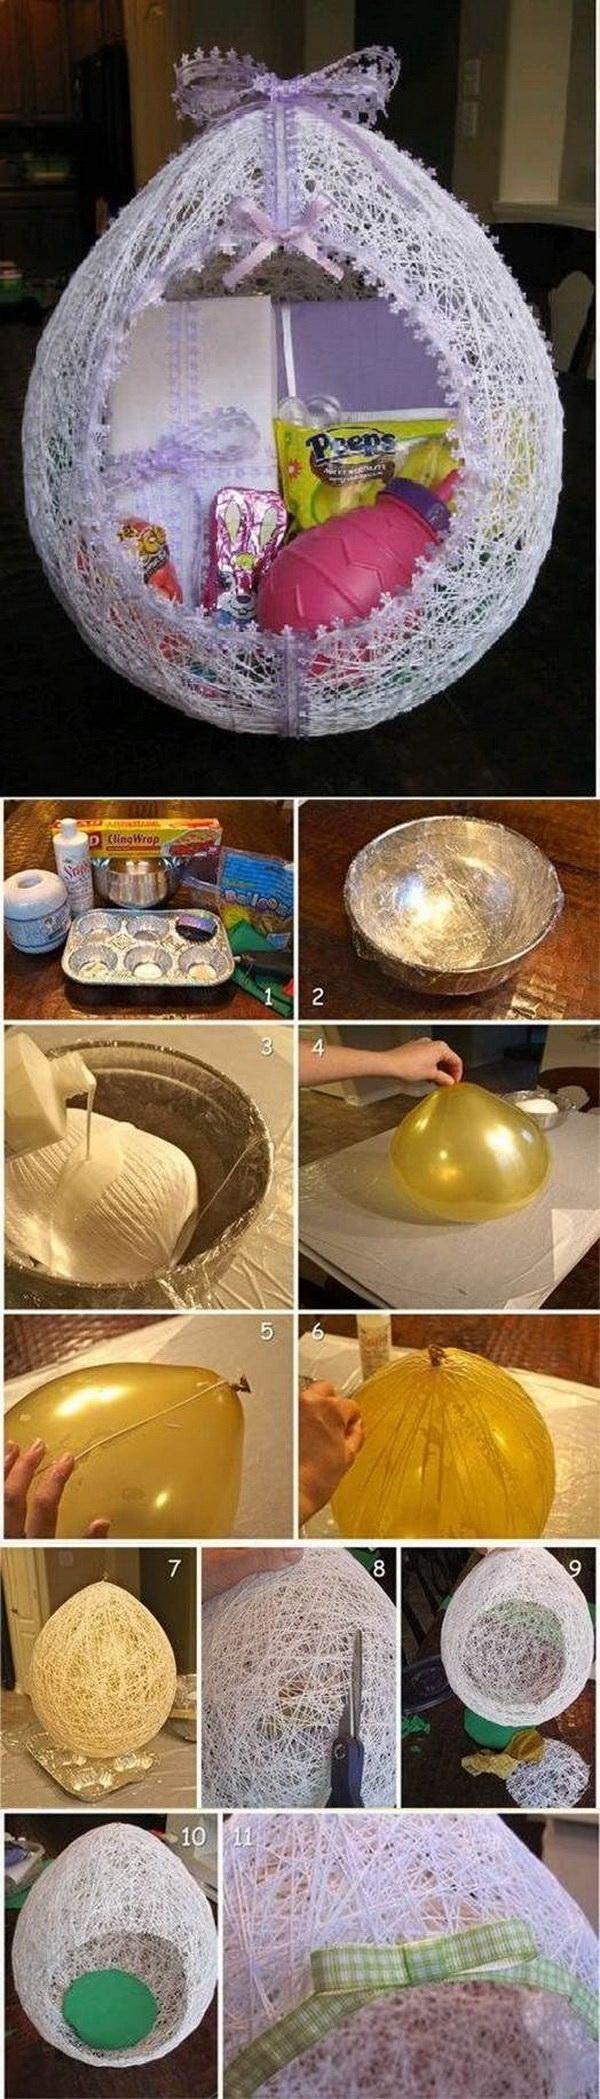 DIY Easter Decoration Ideas: Egg Shaped Easter Basket From String.